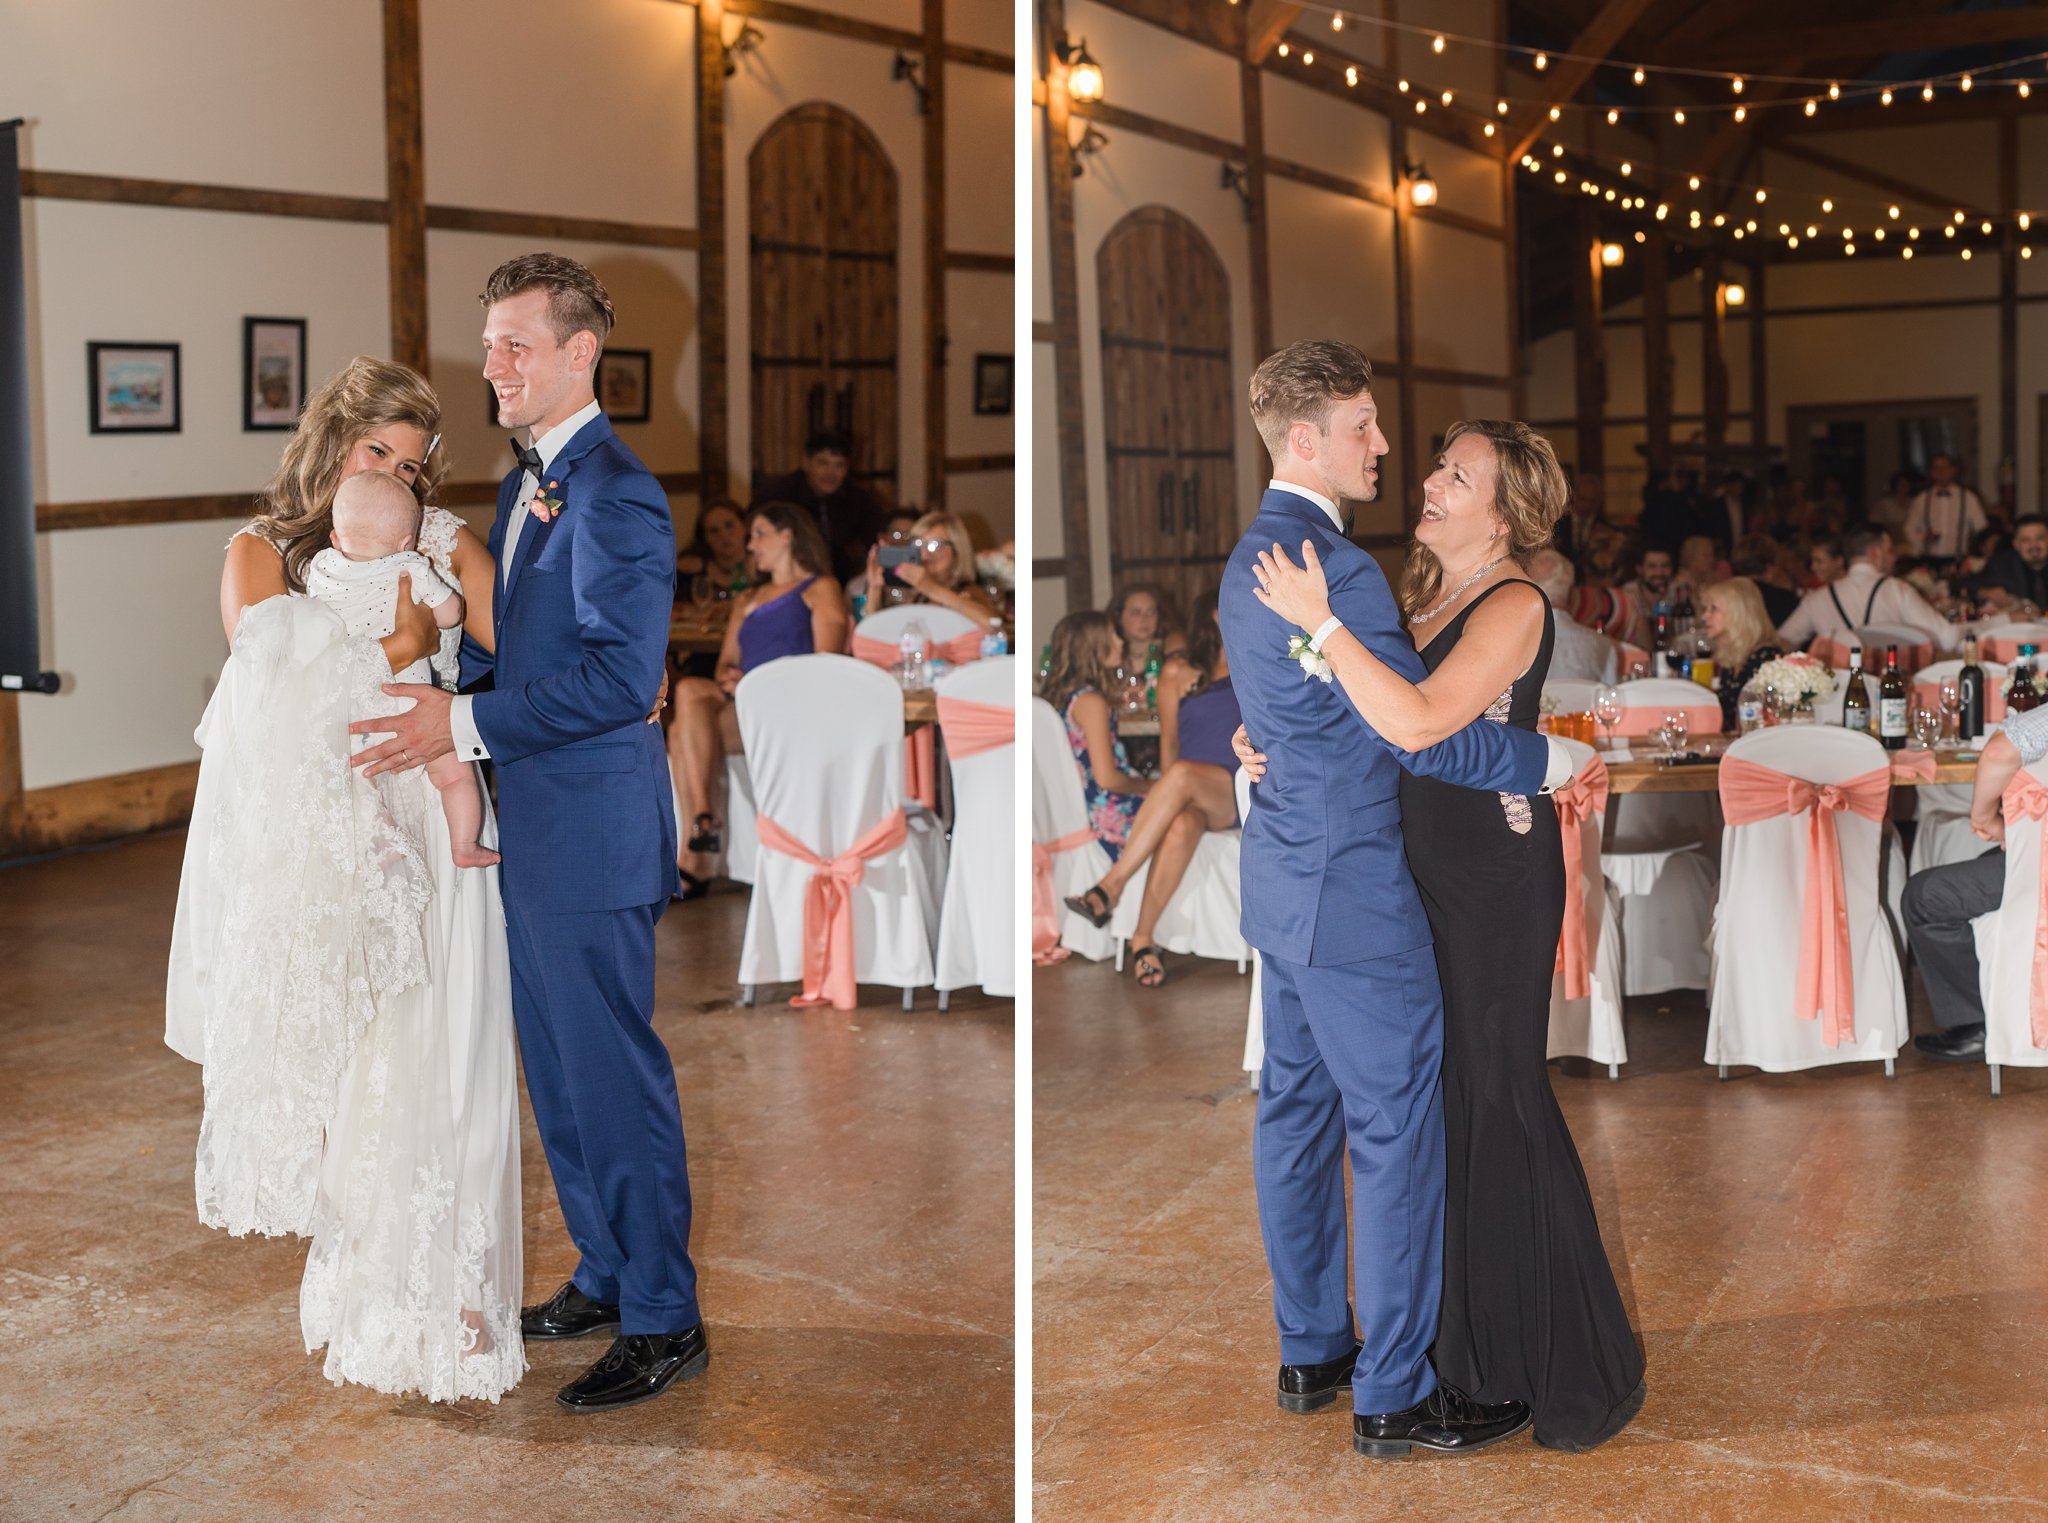 First dances Vineyard wedding at Jabulani Amy Pinder Photography